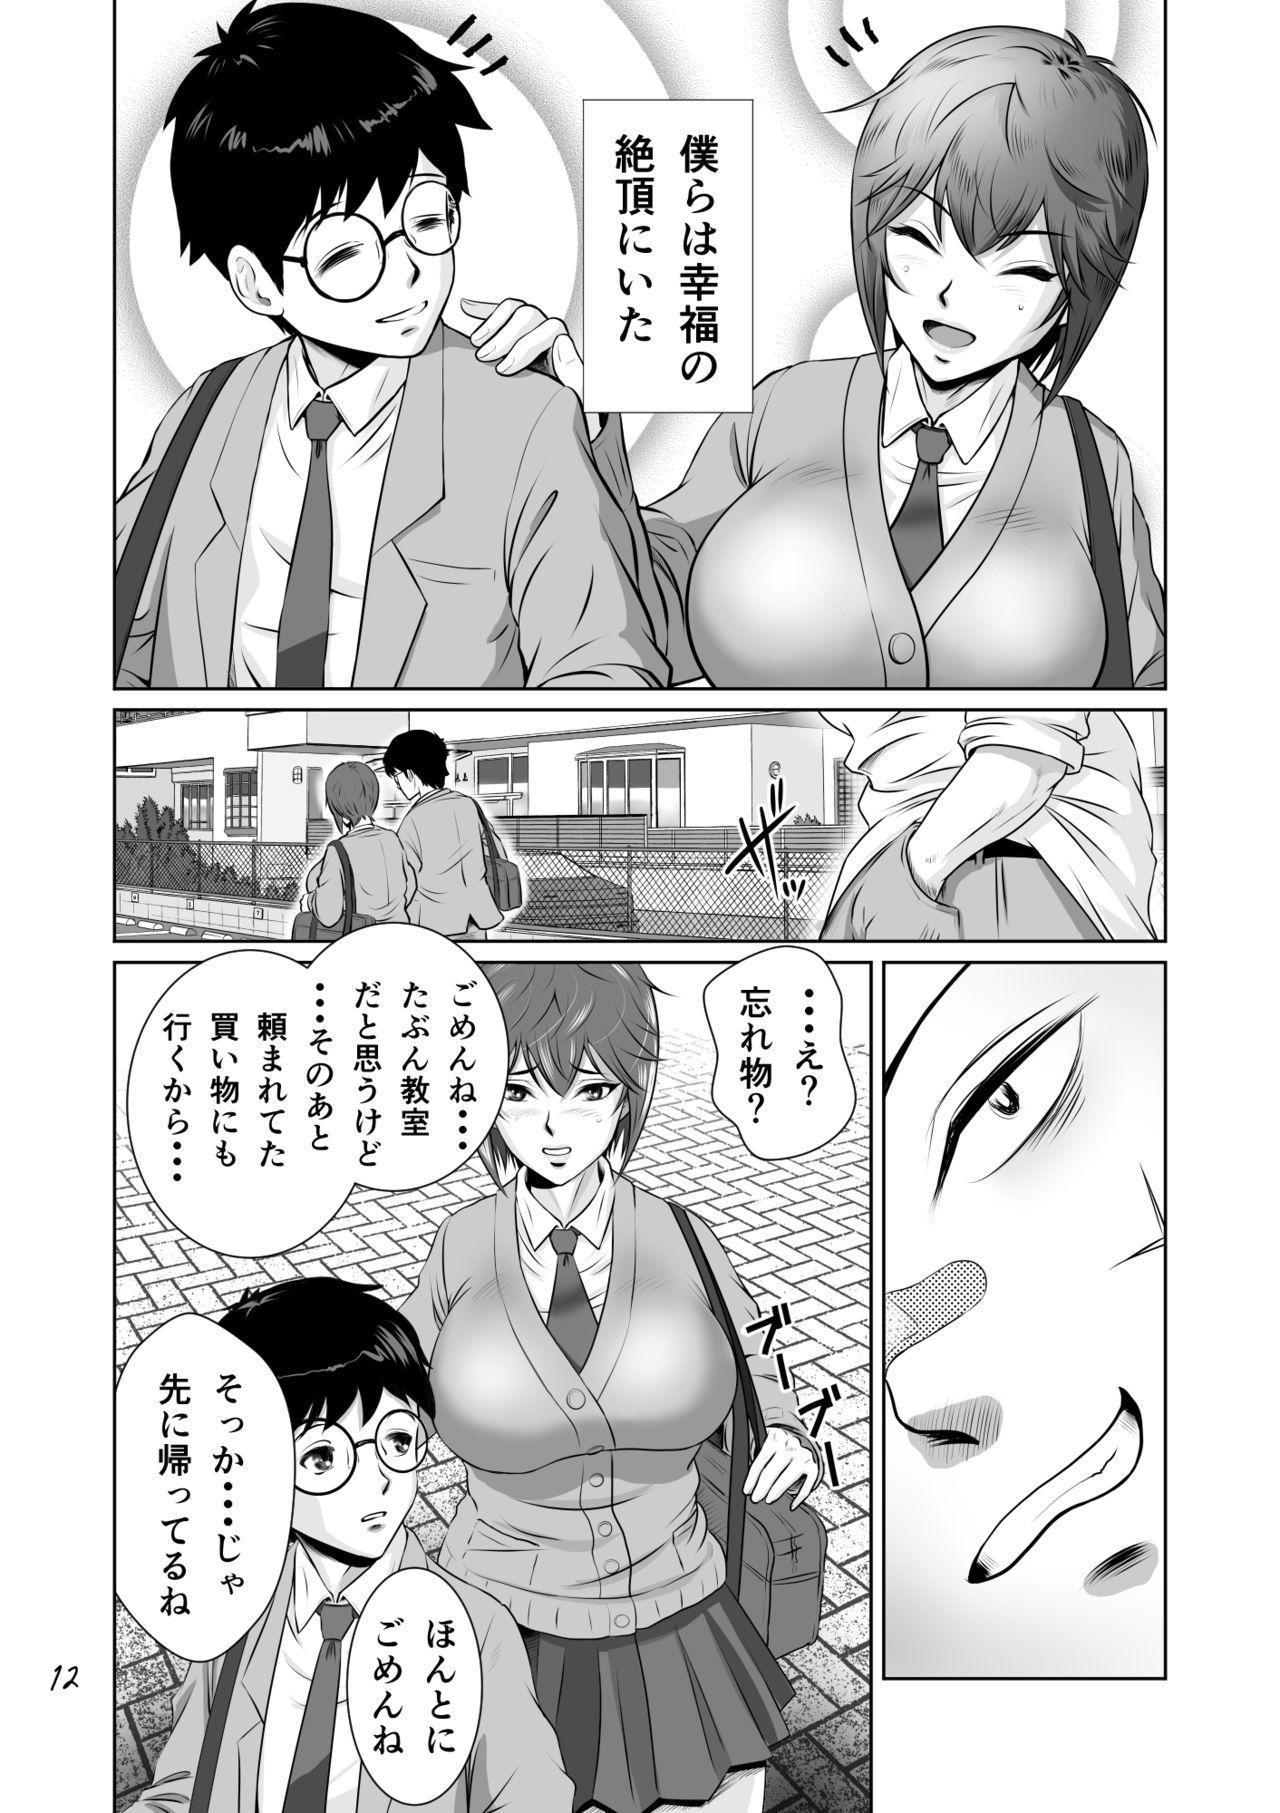 Netorare Osananajimi Haruka-chan Kiki Ippatsu!! 12